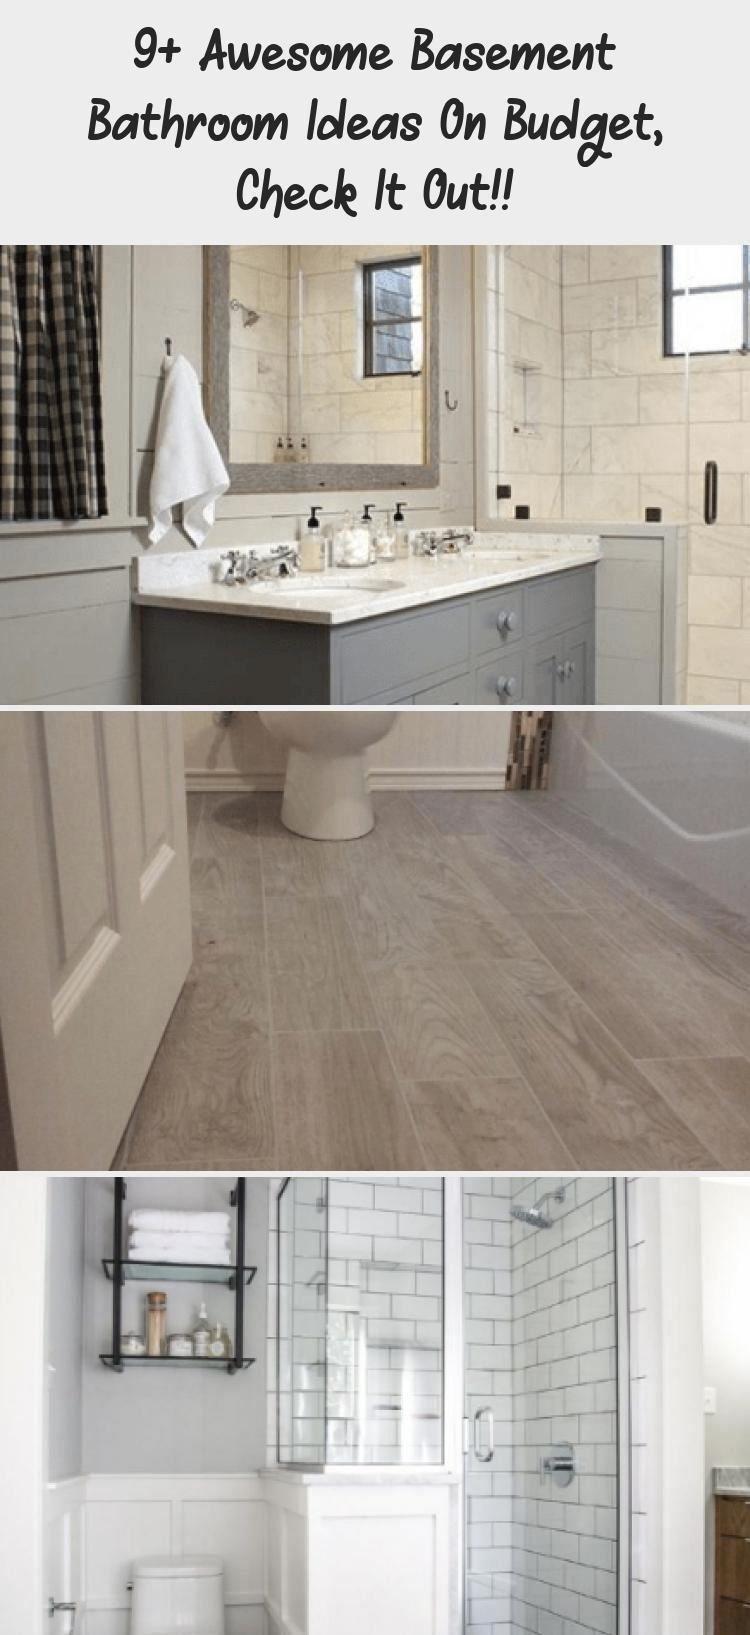 9 Awesome Basement Bathroom Ideas On Budget Check It Out Basementbathroomde 1000 Bathrooms Remodel Basement Bathroom Bathroom Remodel Cost [ jpg ]